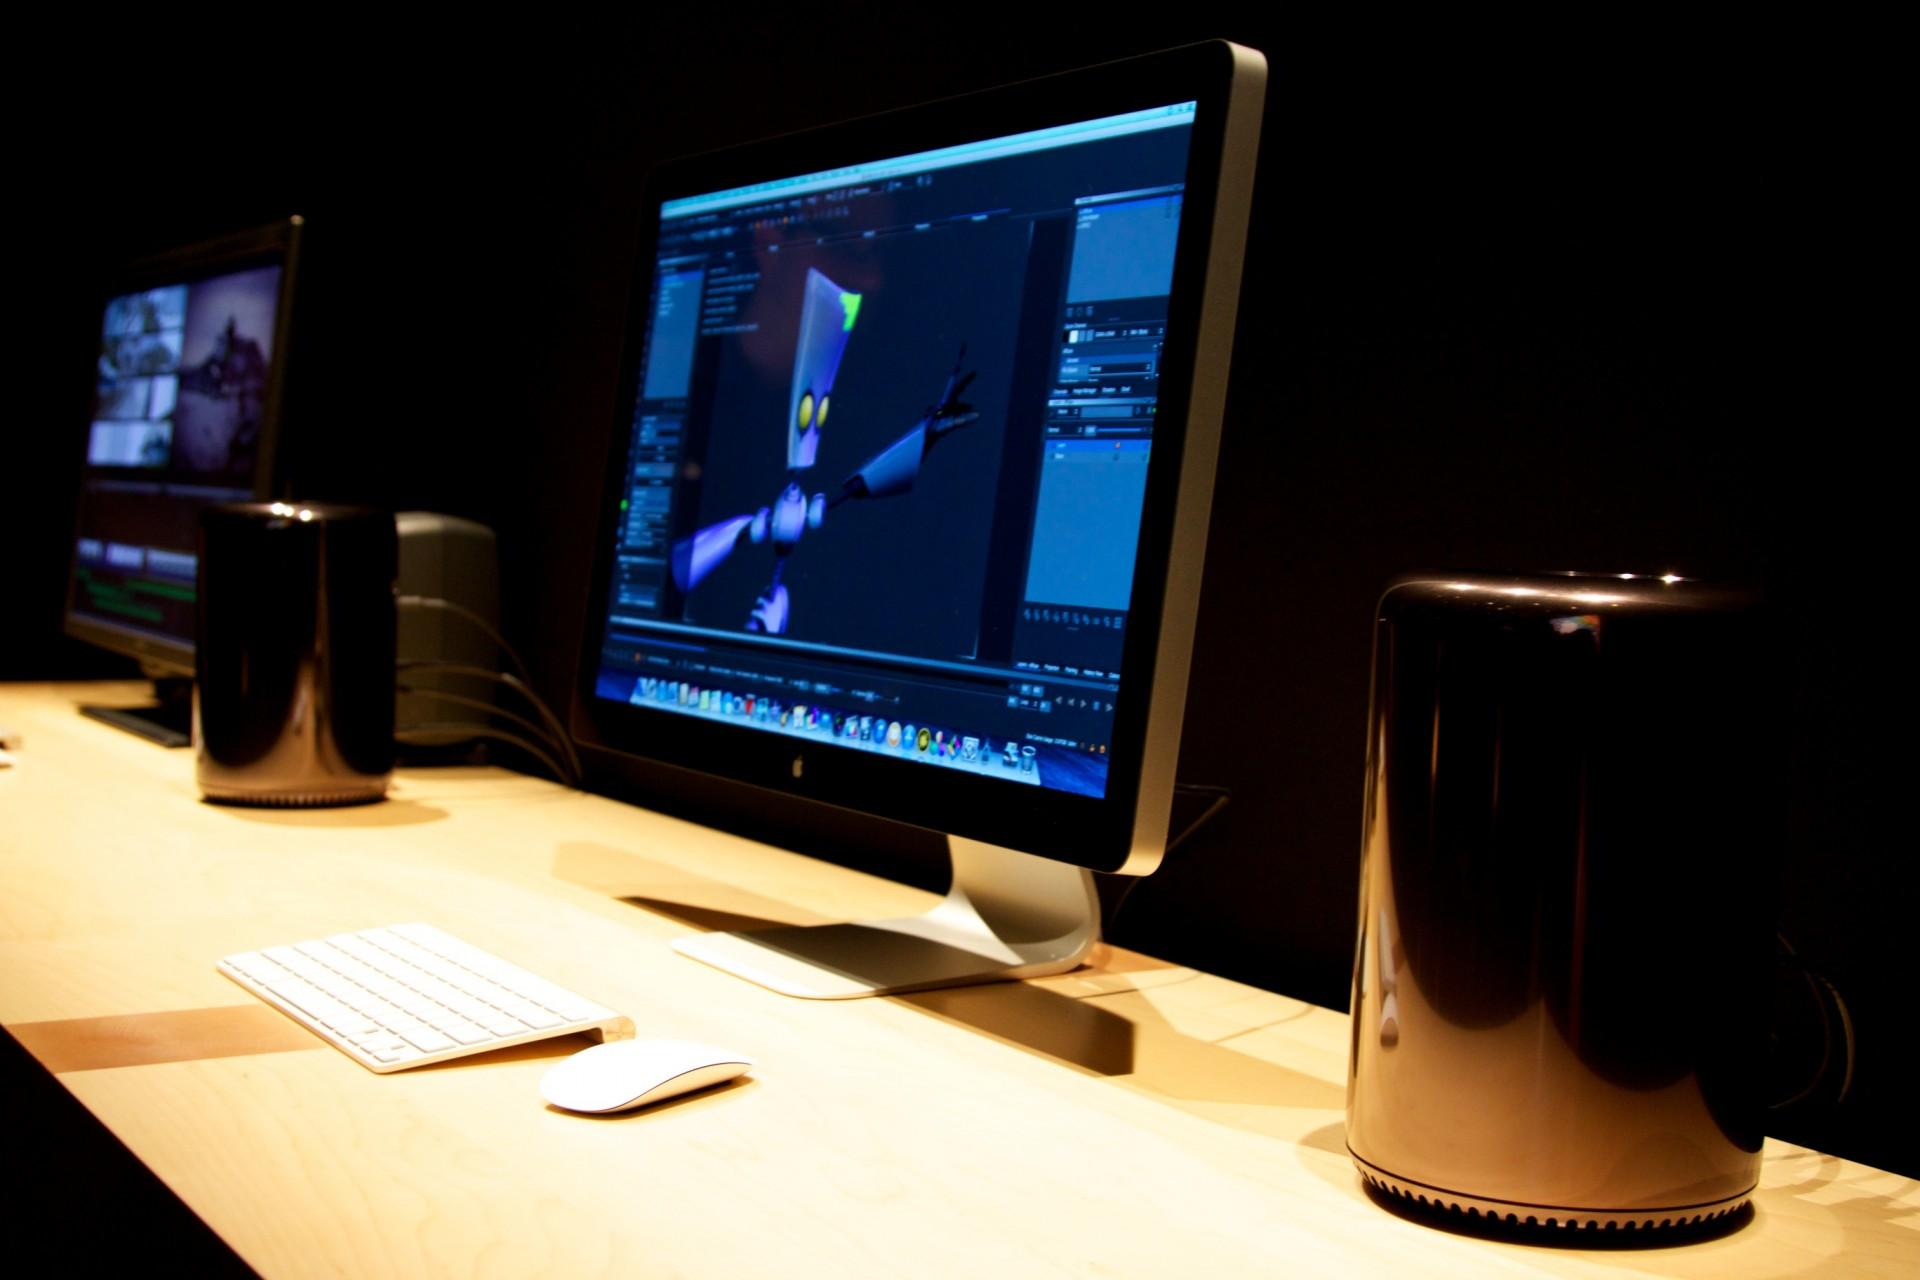 Apple: Mac Pro wird ab 19. Dezember 2013 verkauft - Mac Pro im Hands on